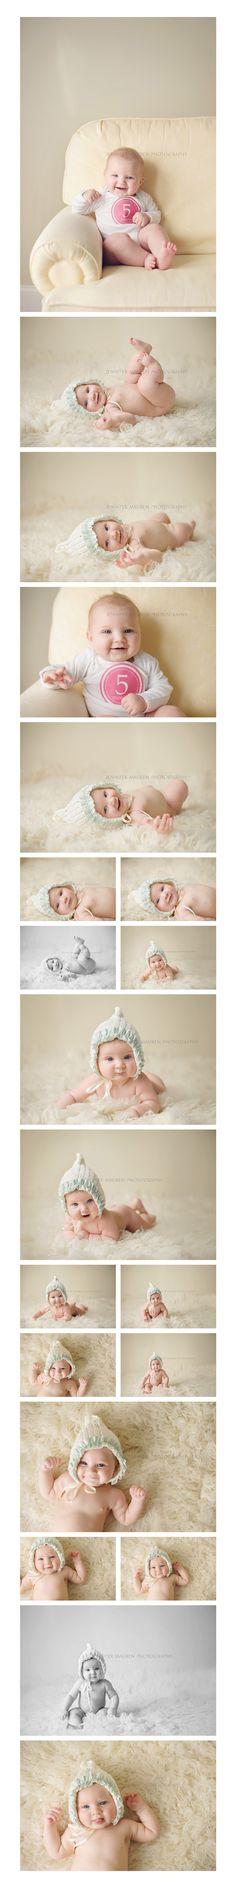 sarasota bradenton lakewood ranch tampa st pete brandon newborn photographer | Jennifer Mauren Photography Bradenton FL